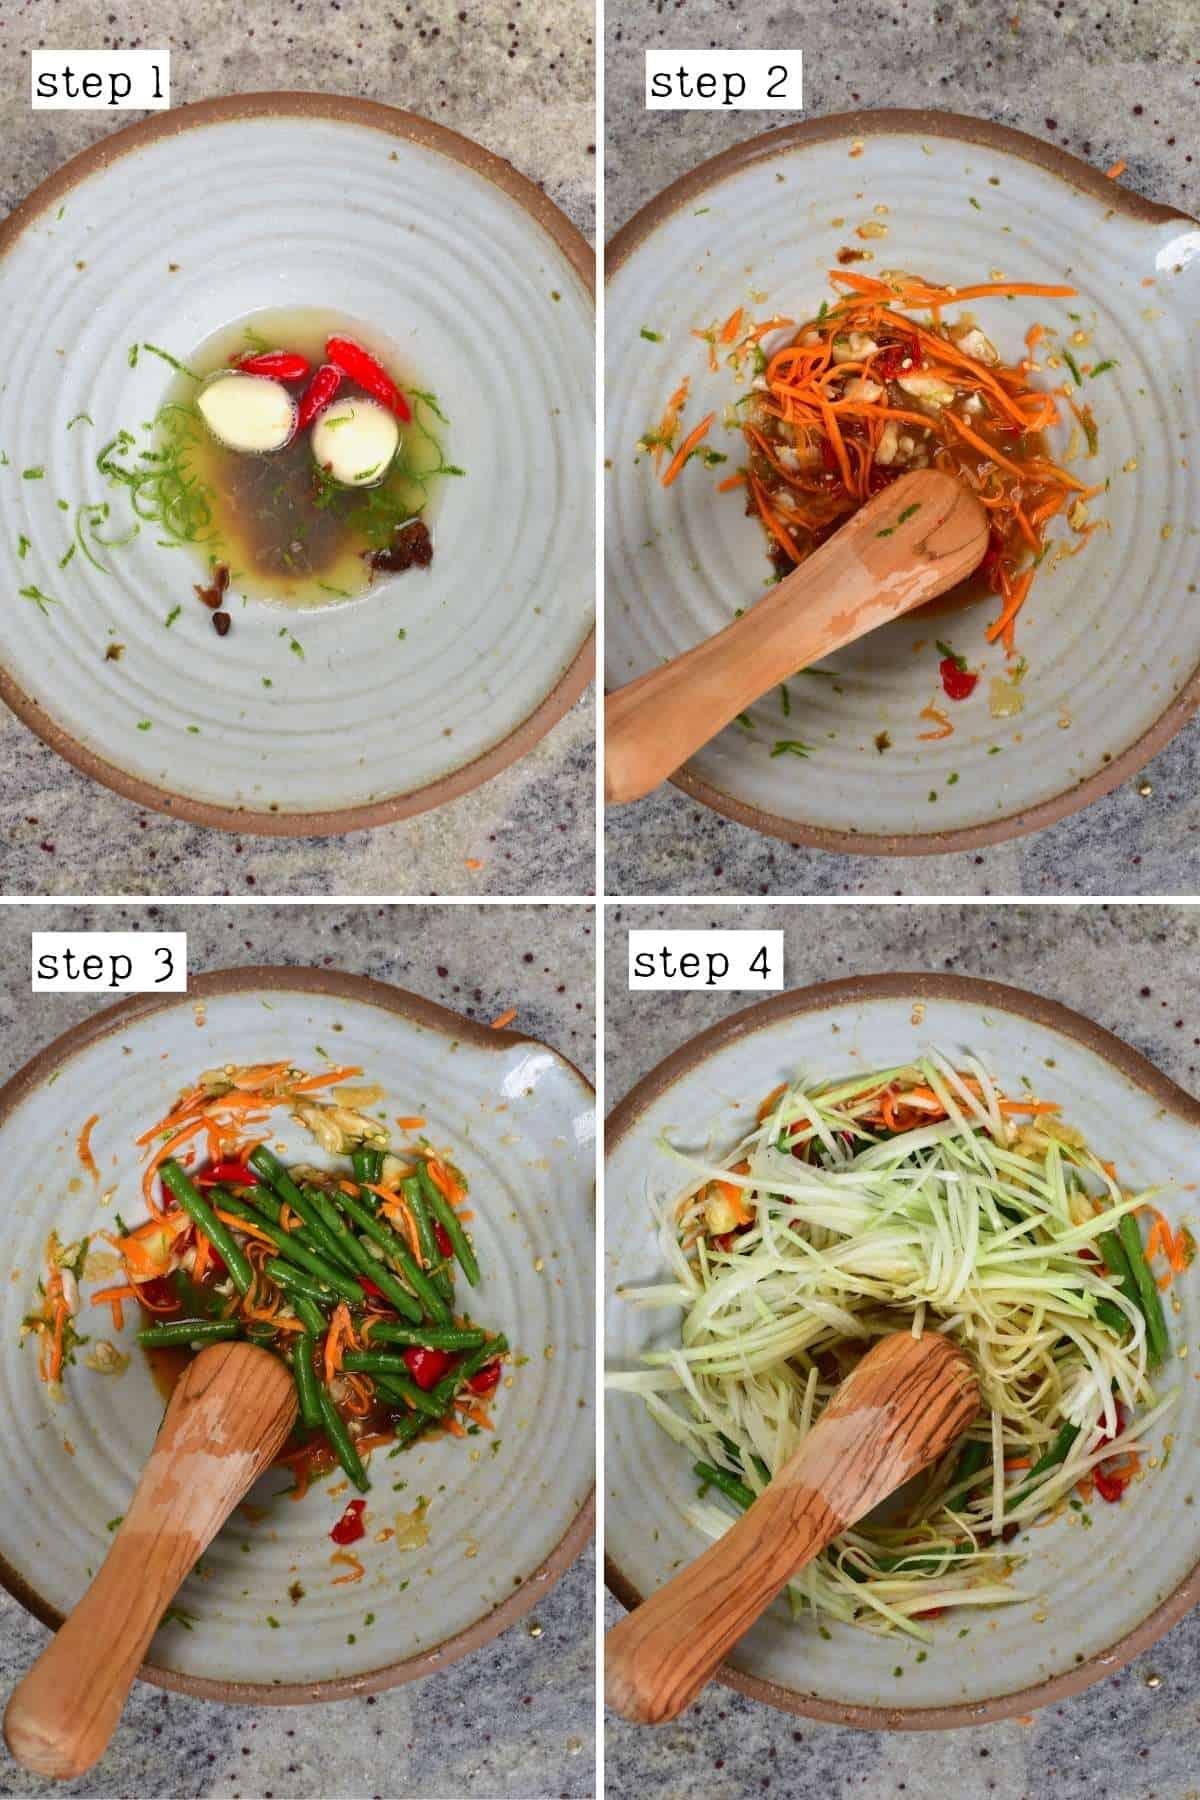 Steps to preparing papaya salad